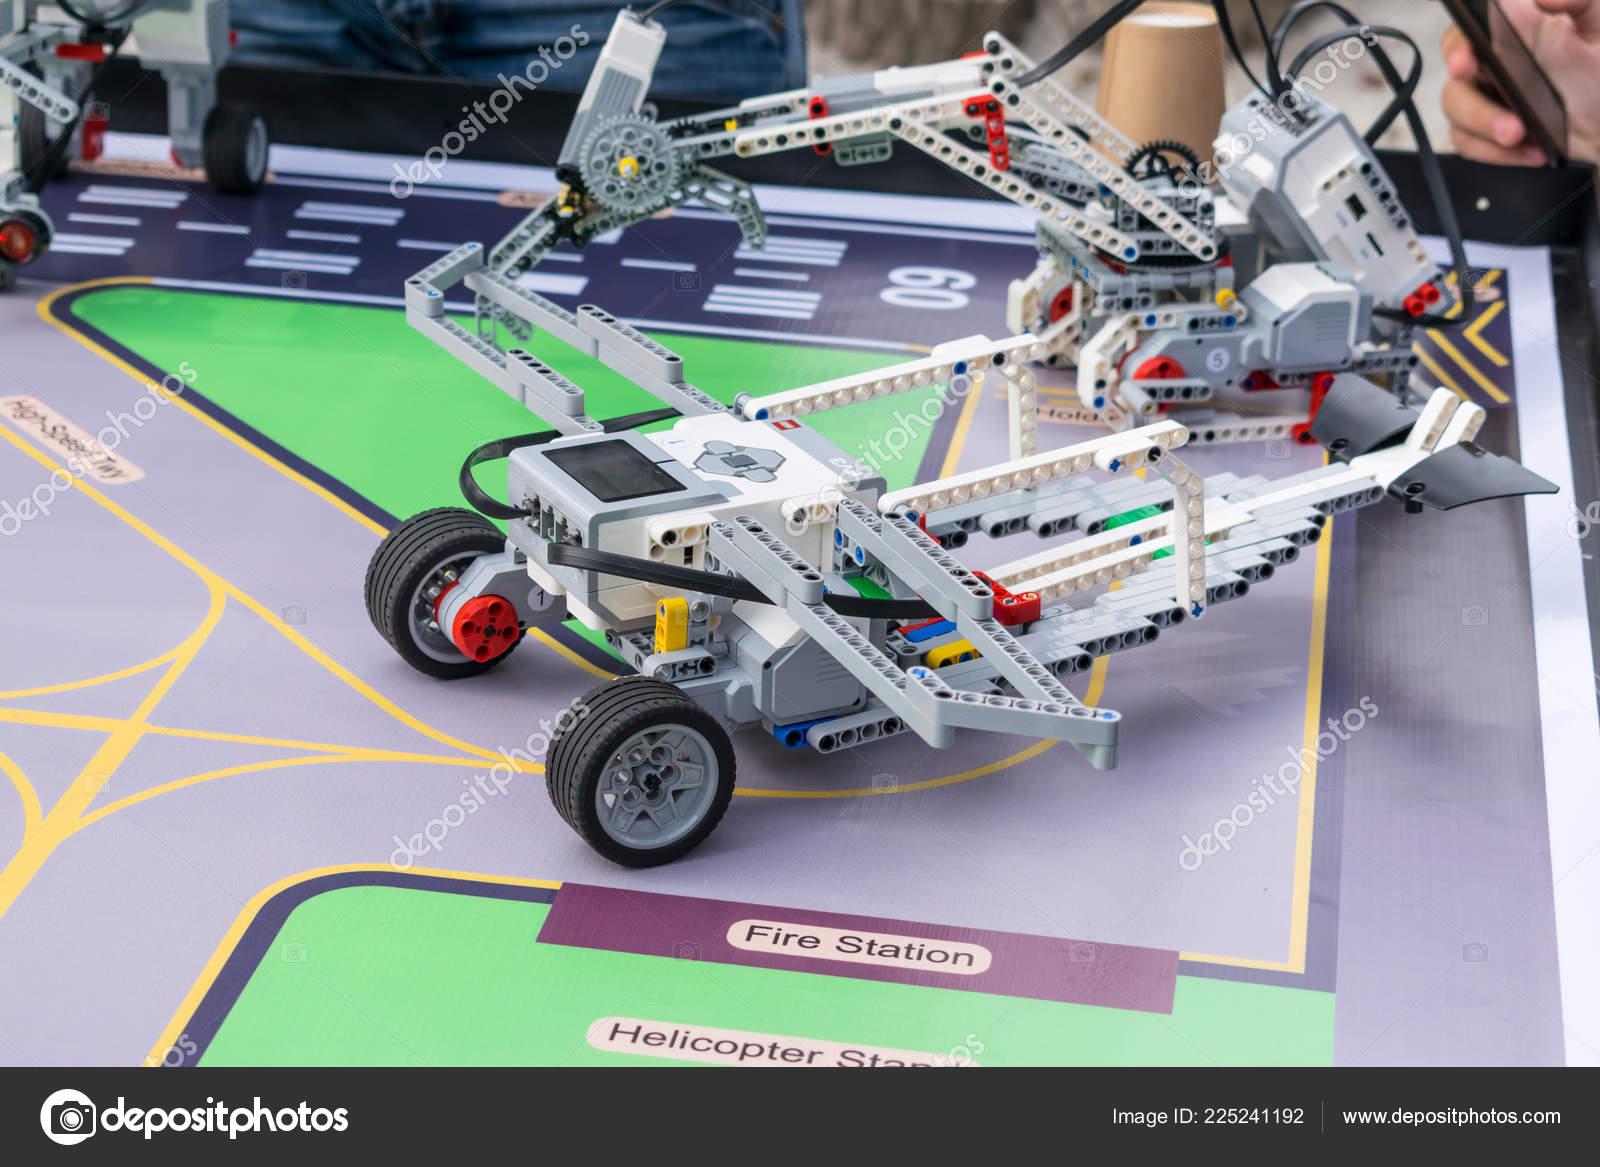 Boys Girls Construct Programming Code Robot Lego Mindstorms